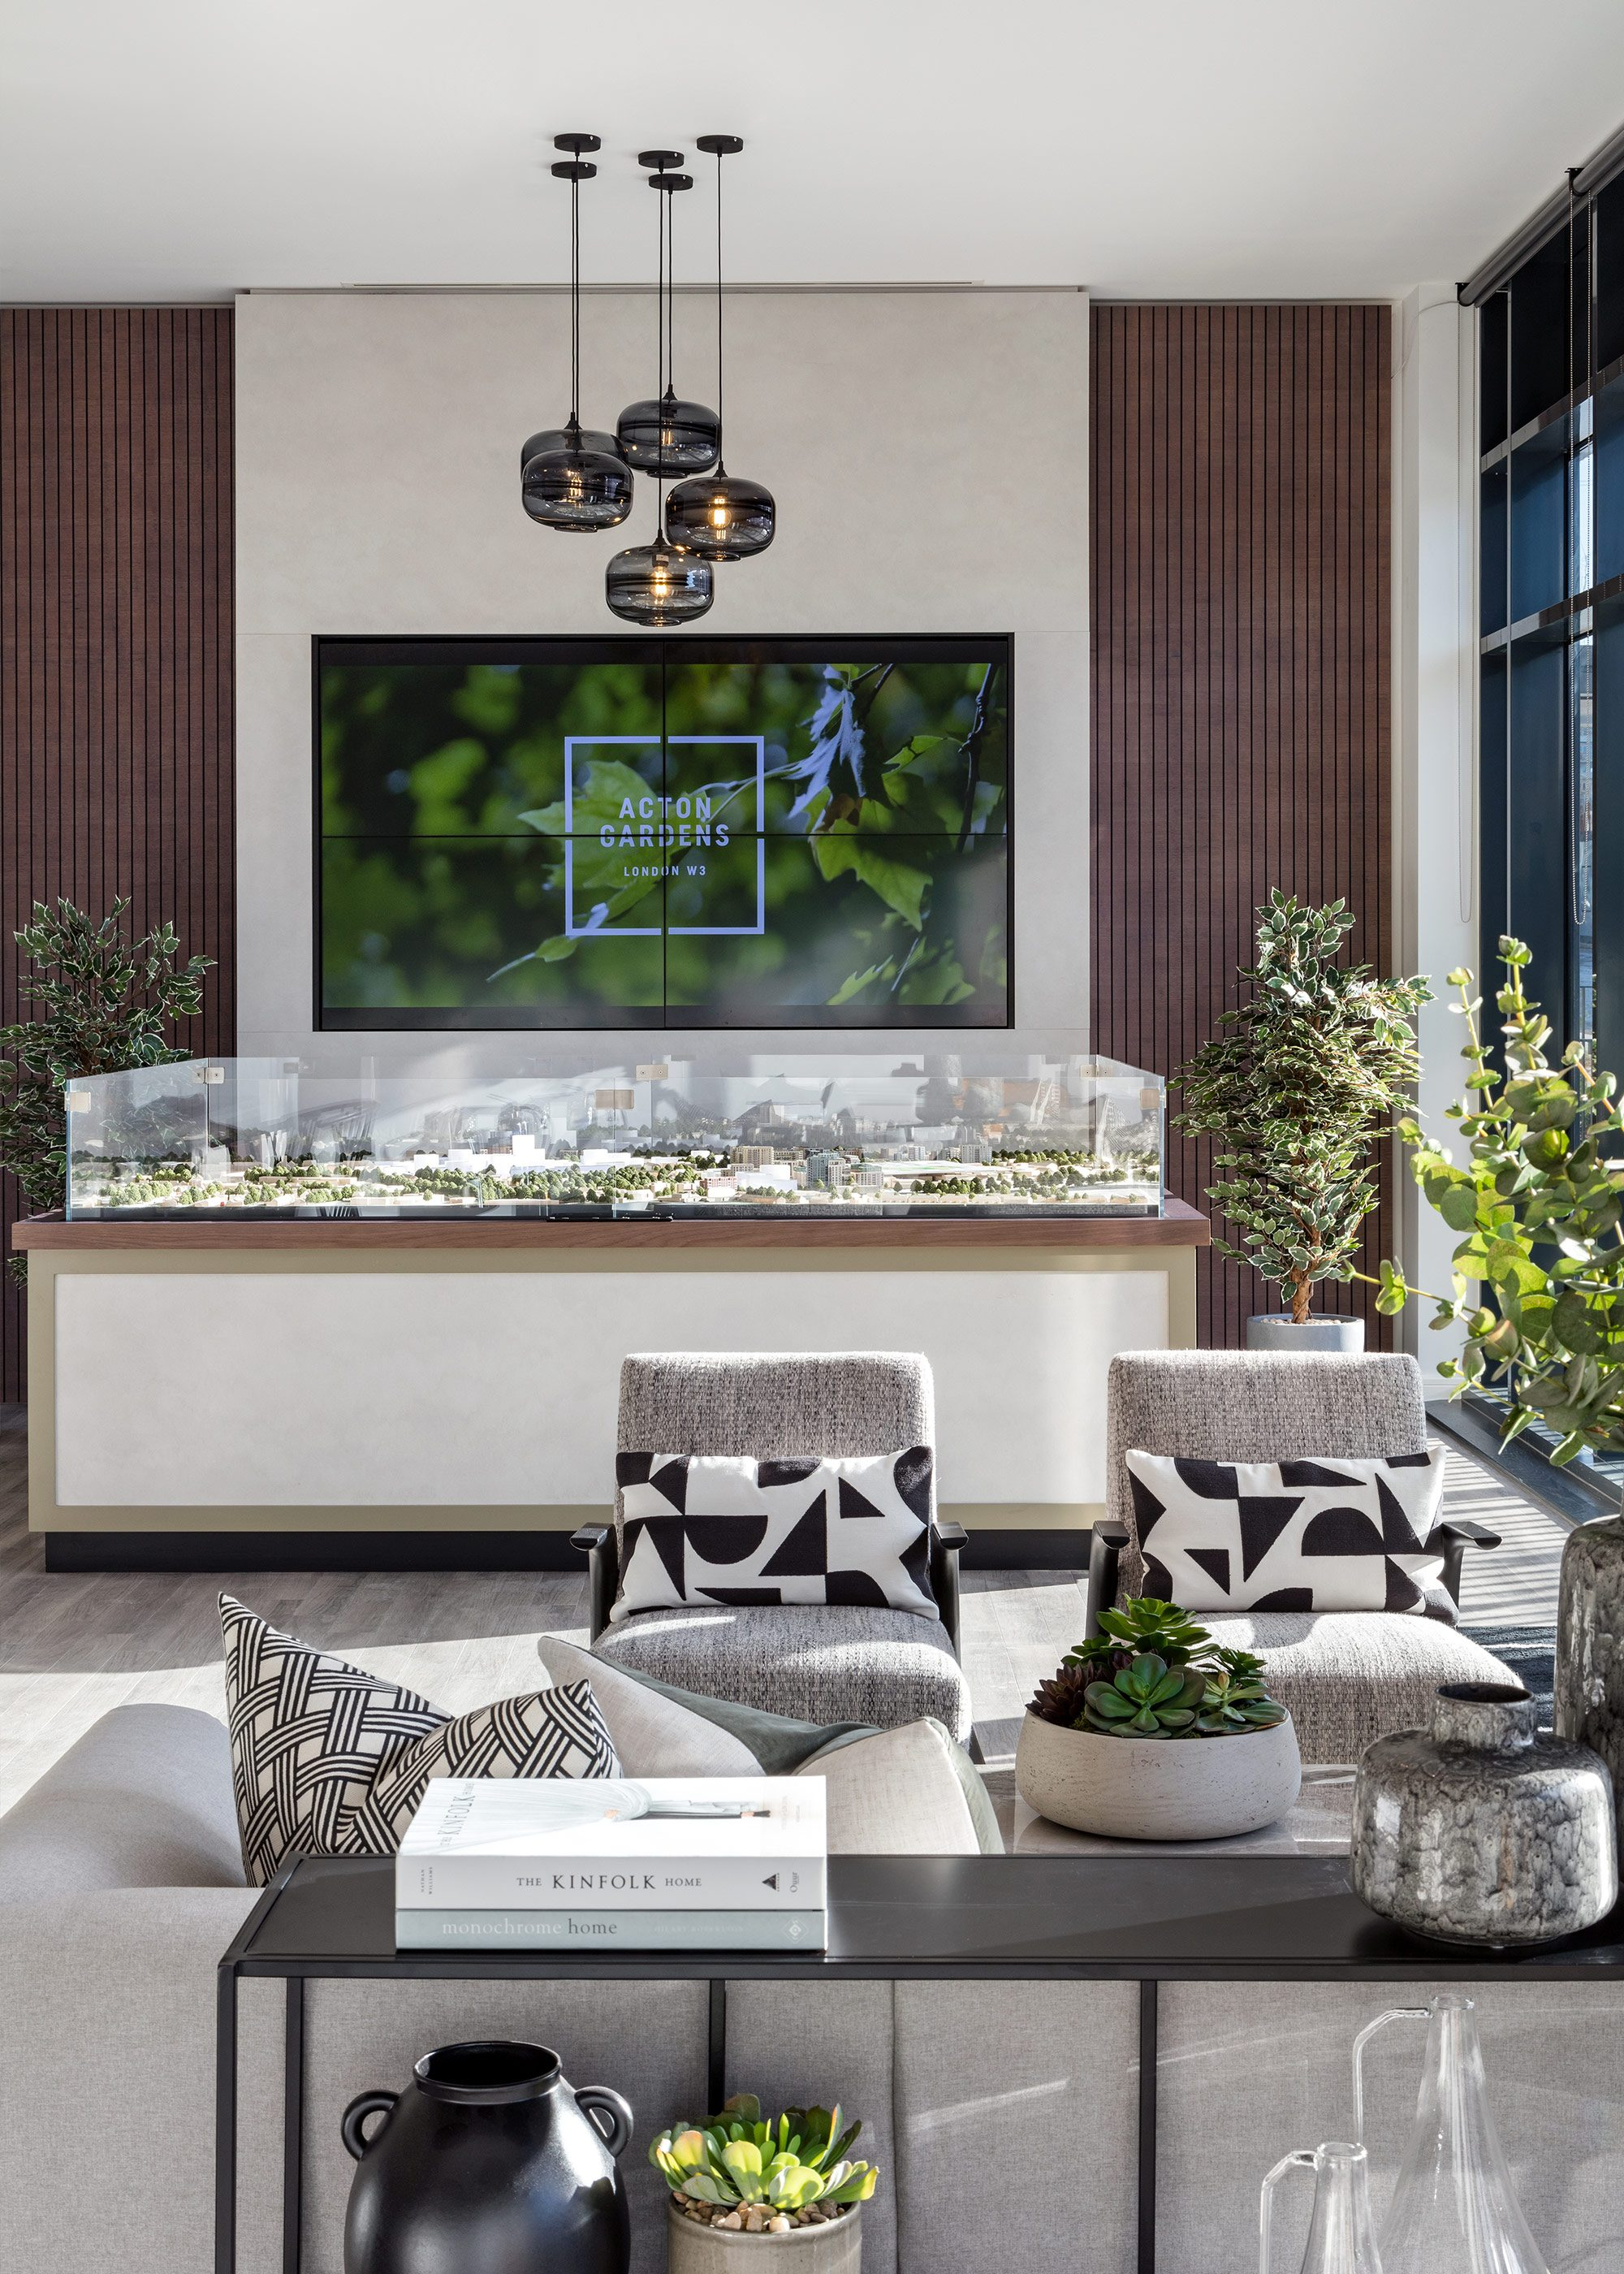 Honky Interior Design Marketing Suites Acton Gardens London Portrait 2